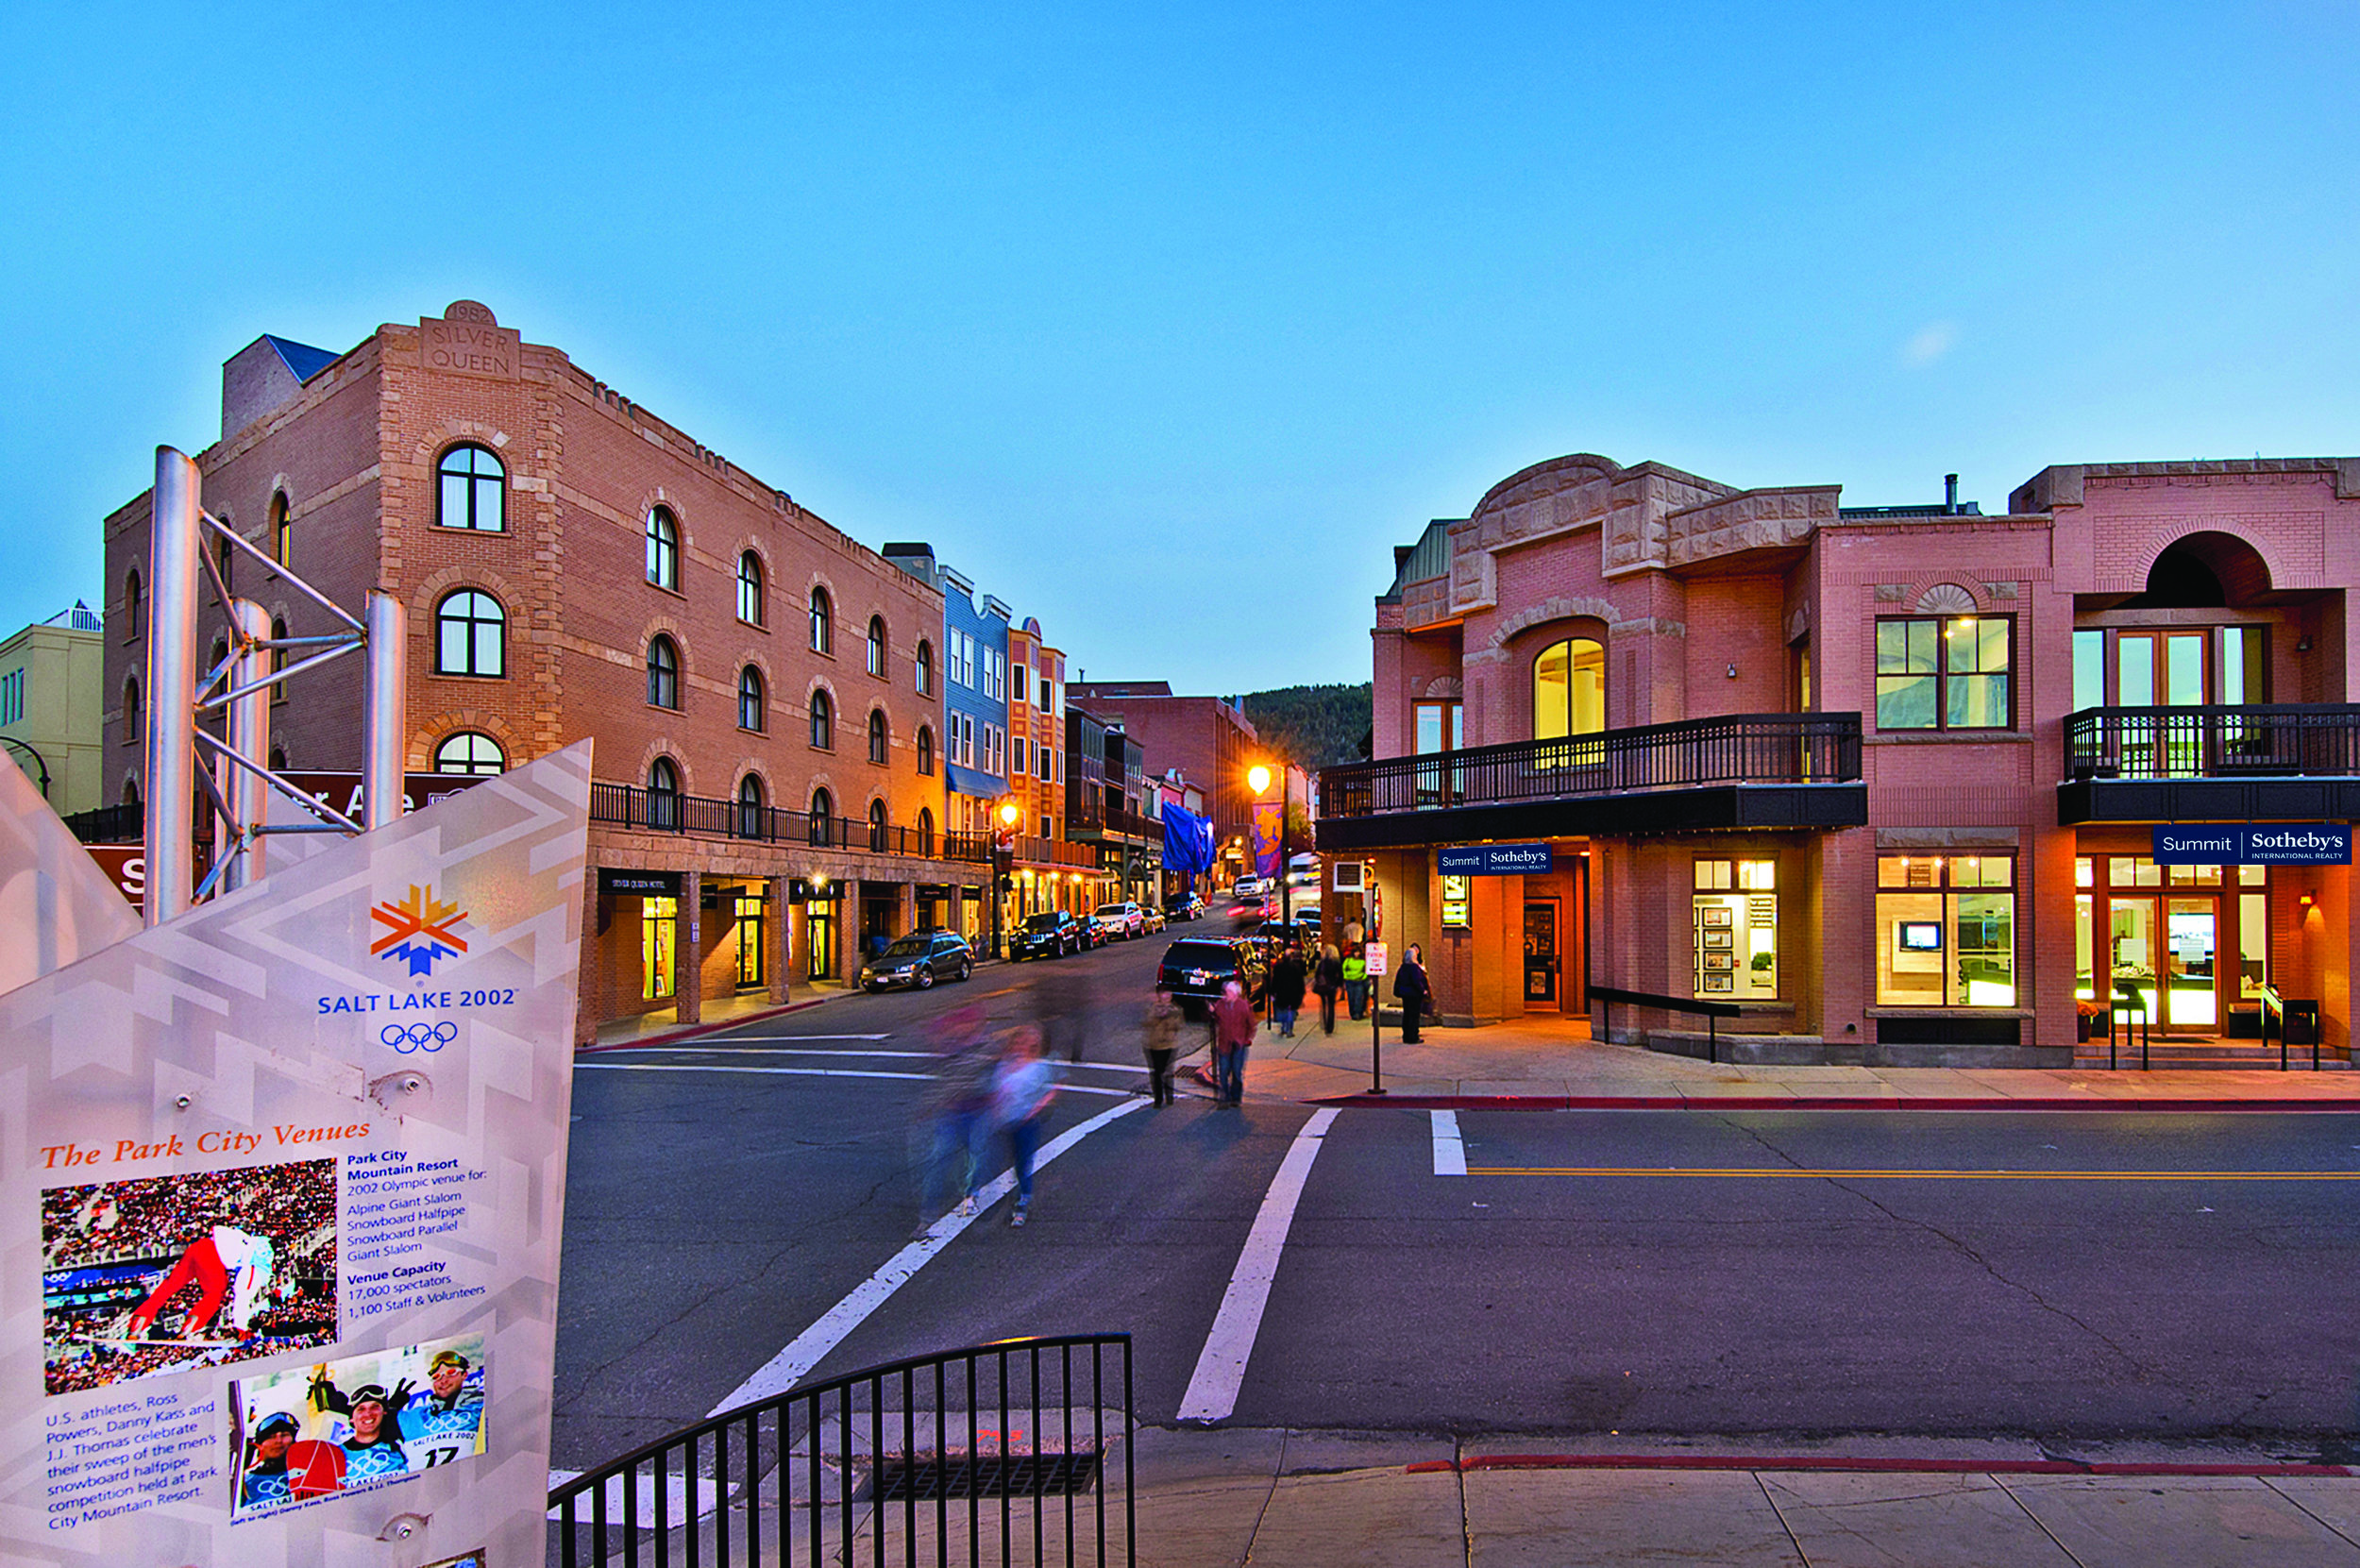 main street gallery - 625 Main StreetPark City, Utah 84060